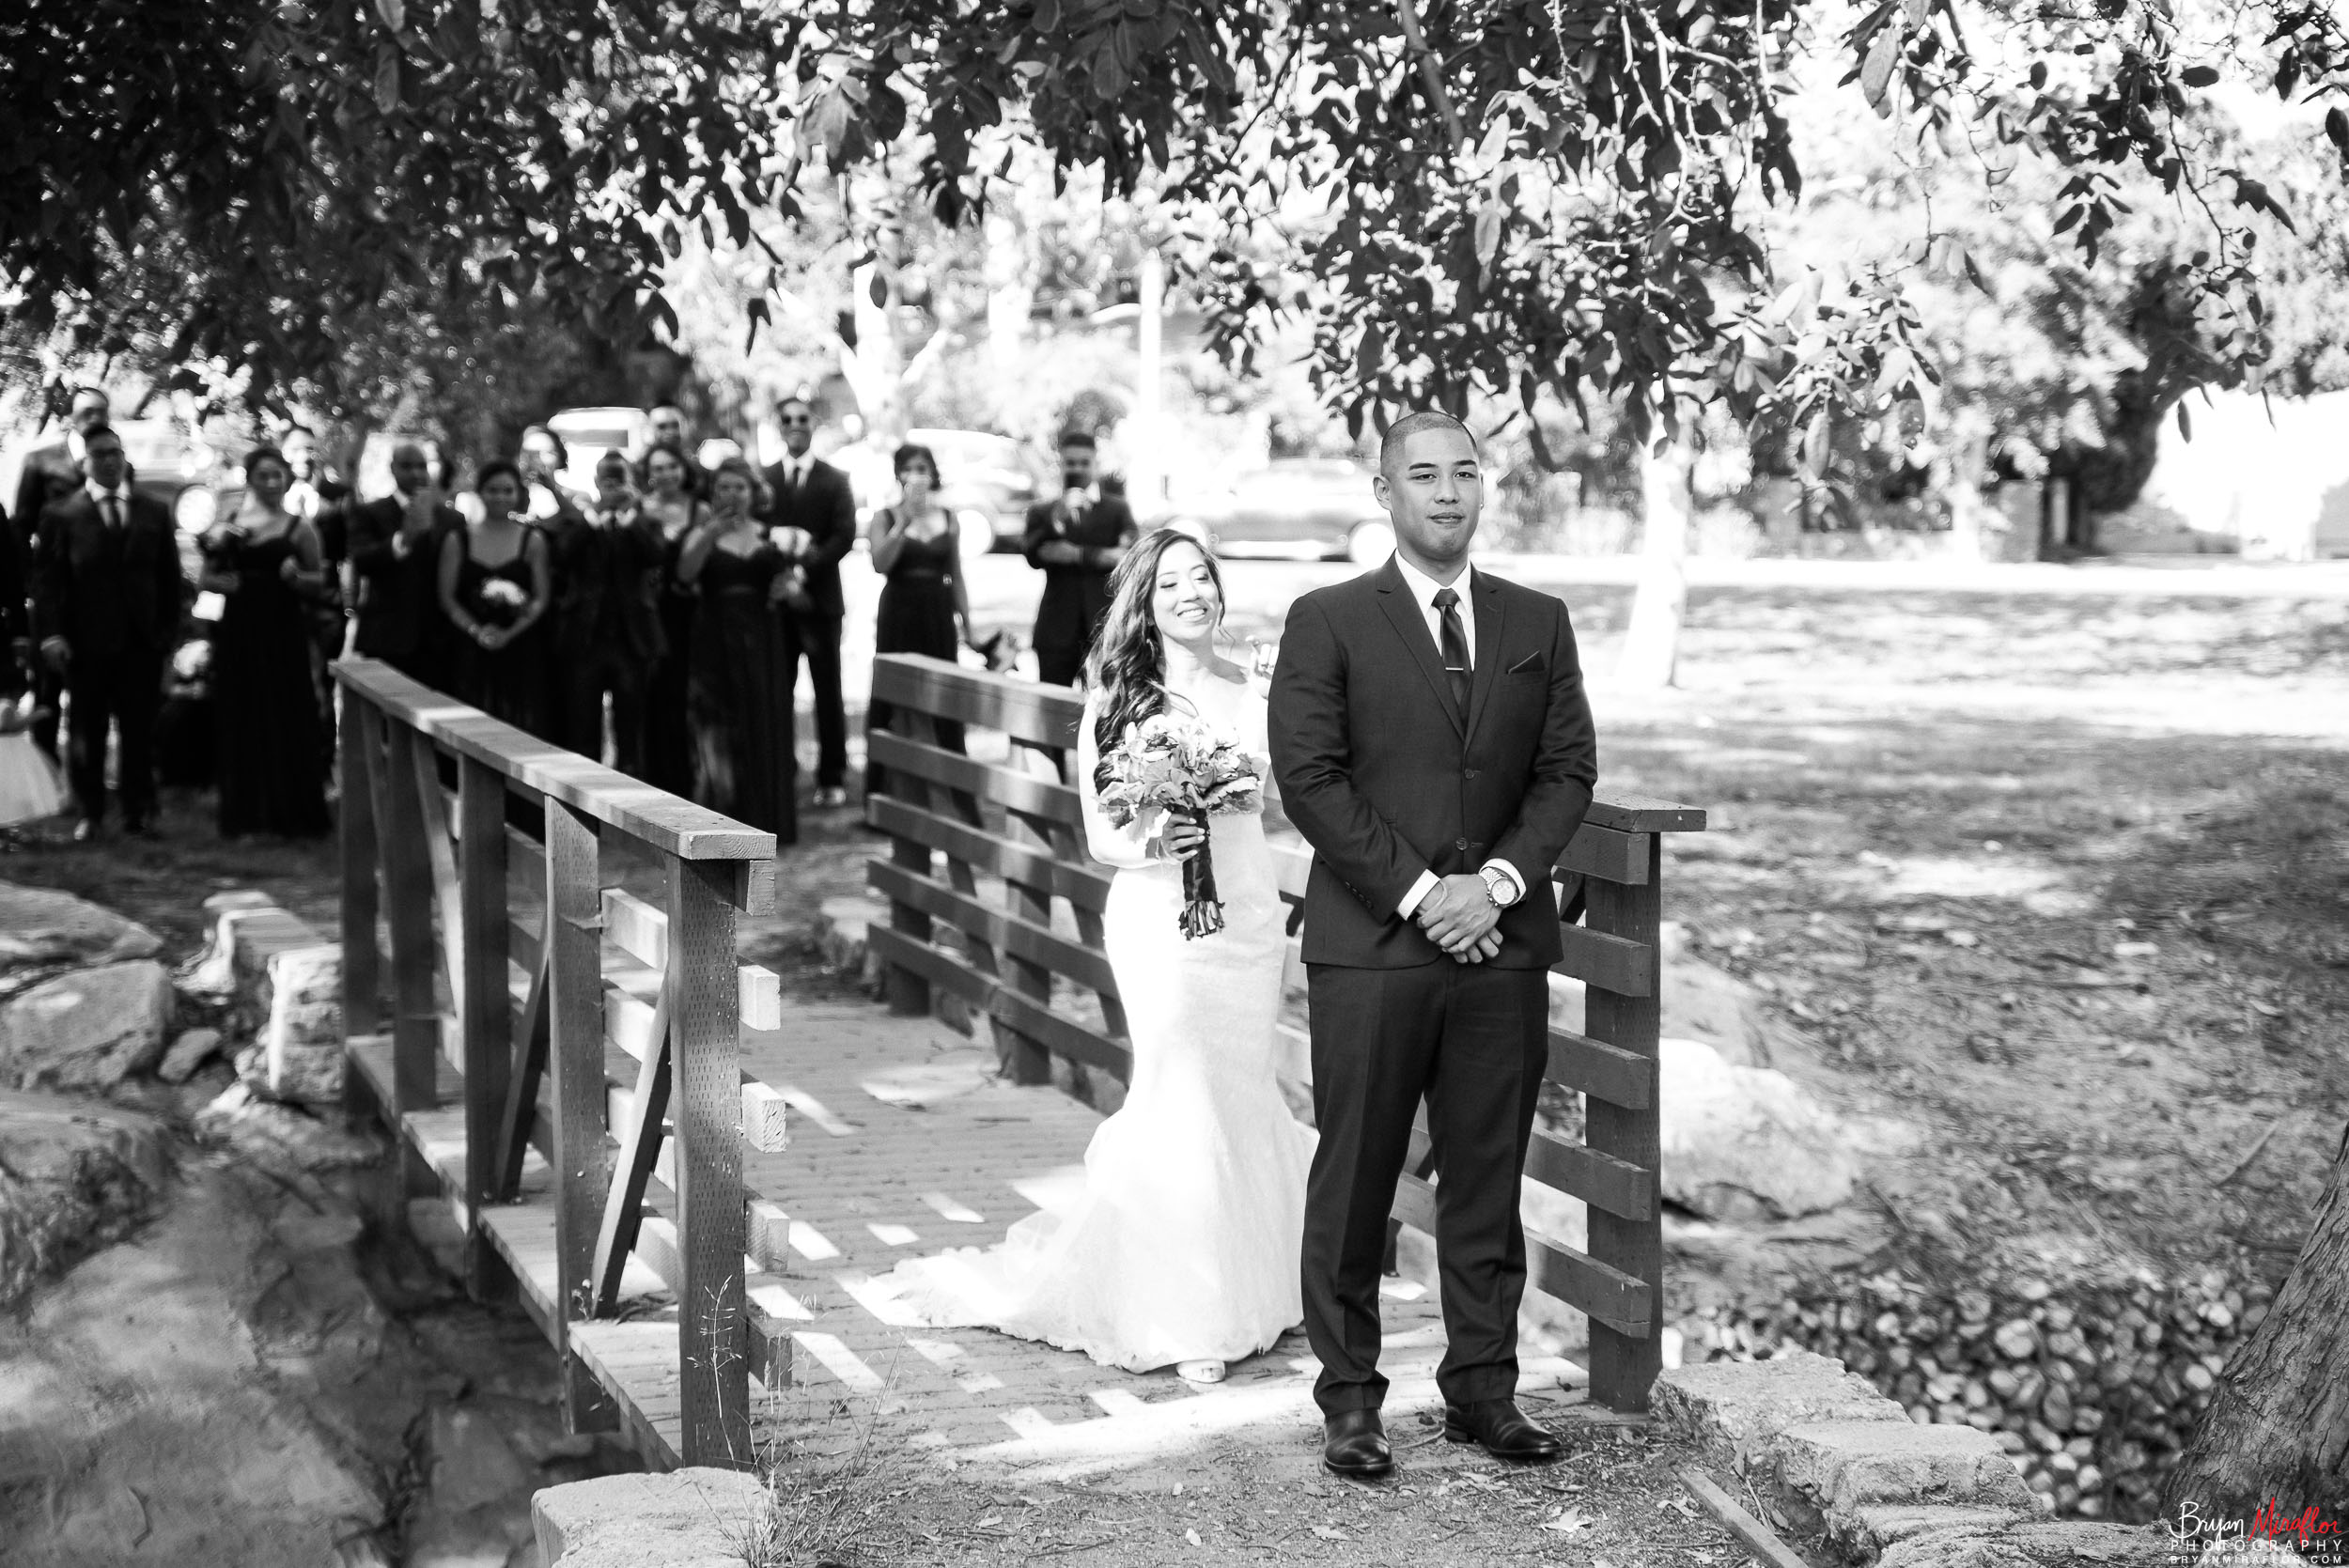 Bryan-Miraflor-Photography-Trisha-Dexter-Married-20170923-016.jpg